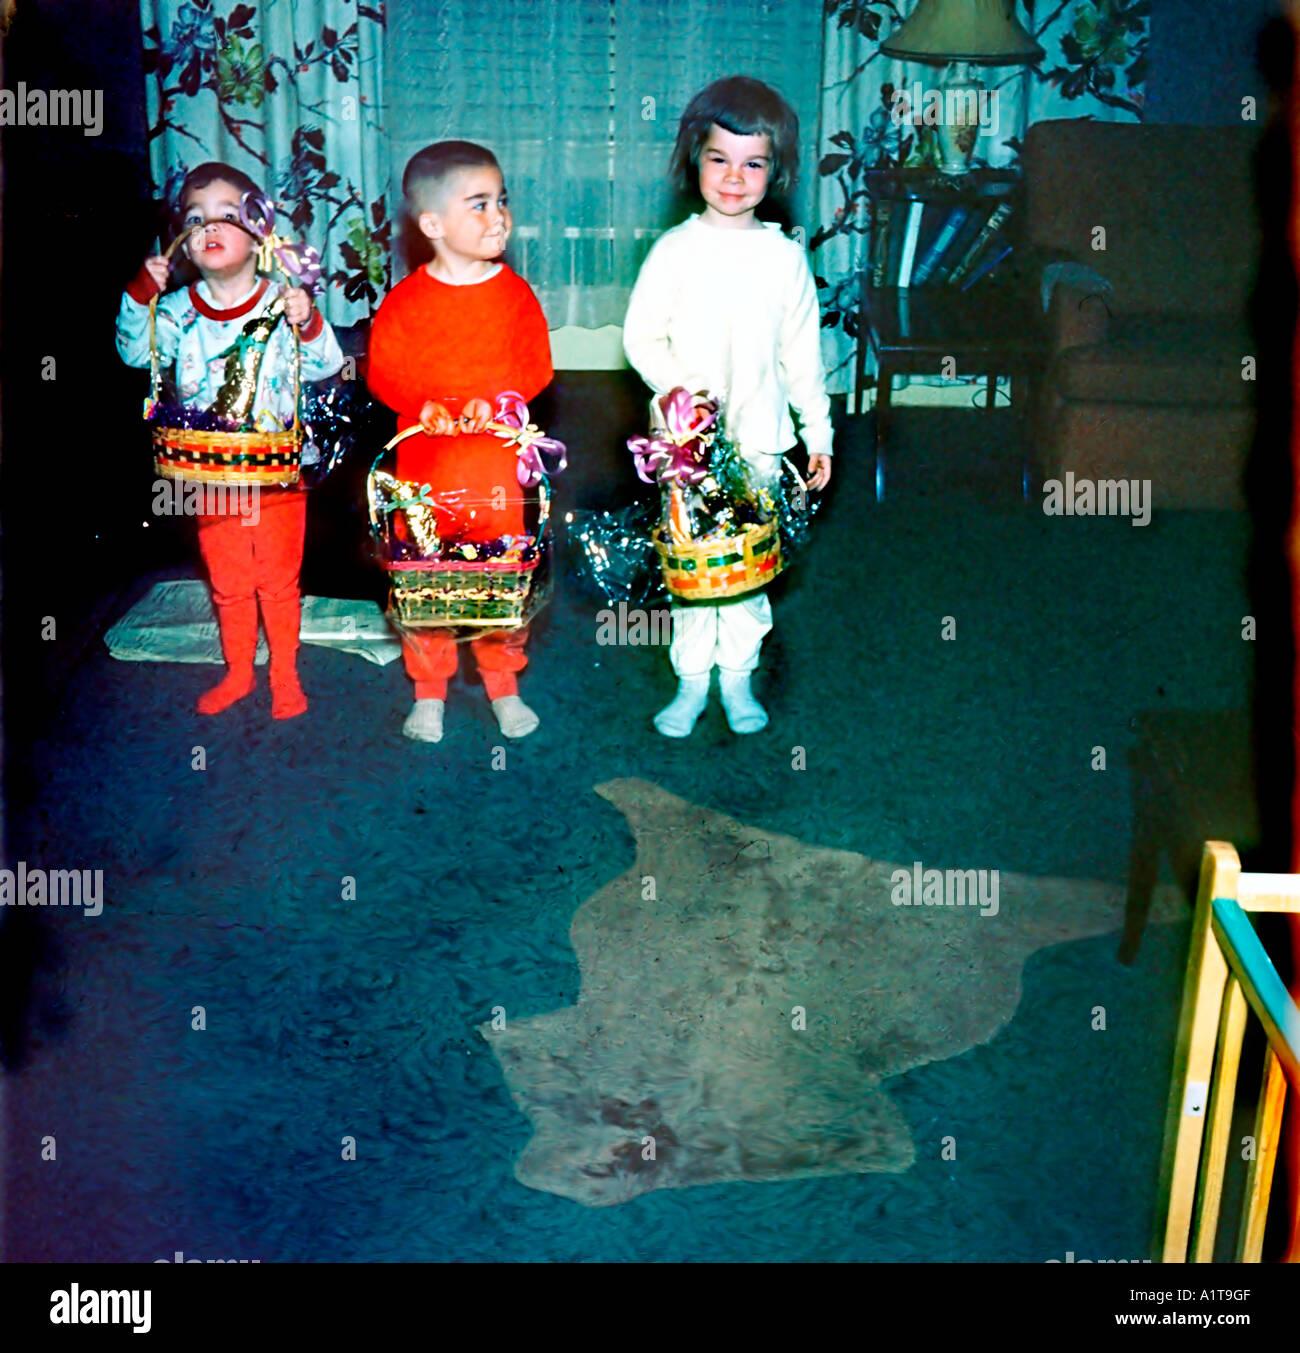 1950s family retro photo children holding easter baskets at home 1950s family retro photo children holding easter baskets at home in living room vintage negle Gallery